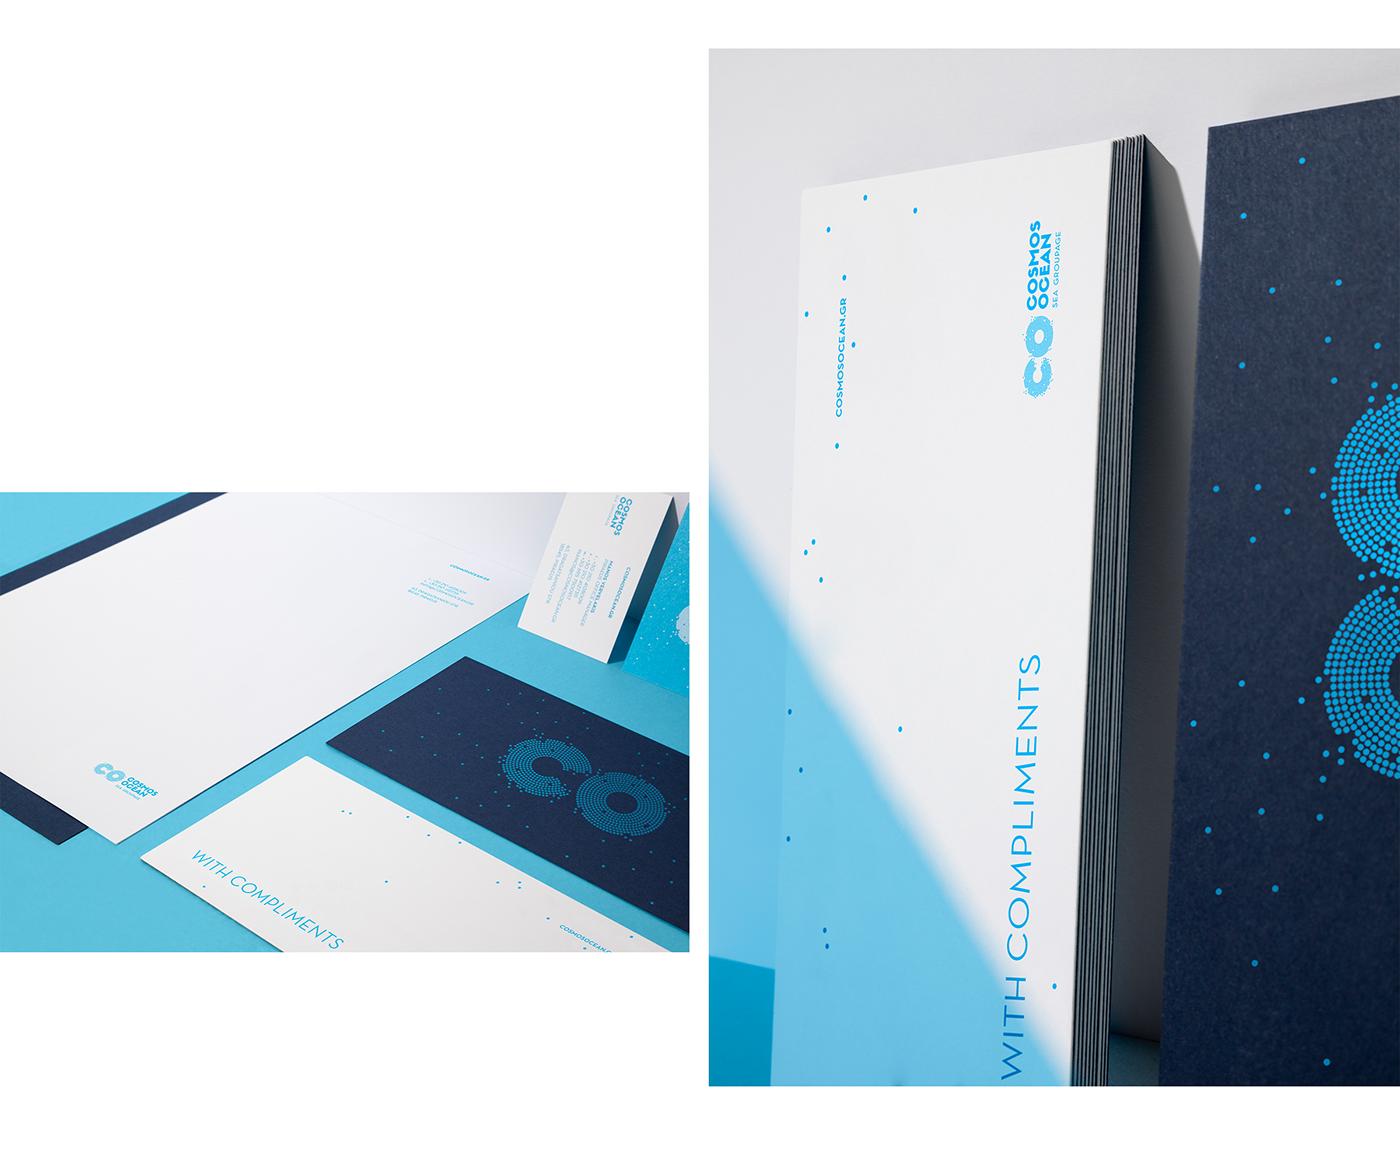 cosmos ocean Corporate Identity identity logo Logotype Greece design branding